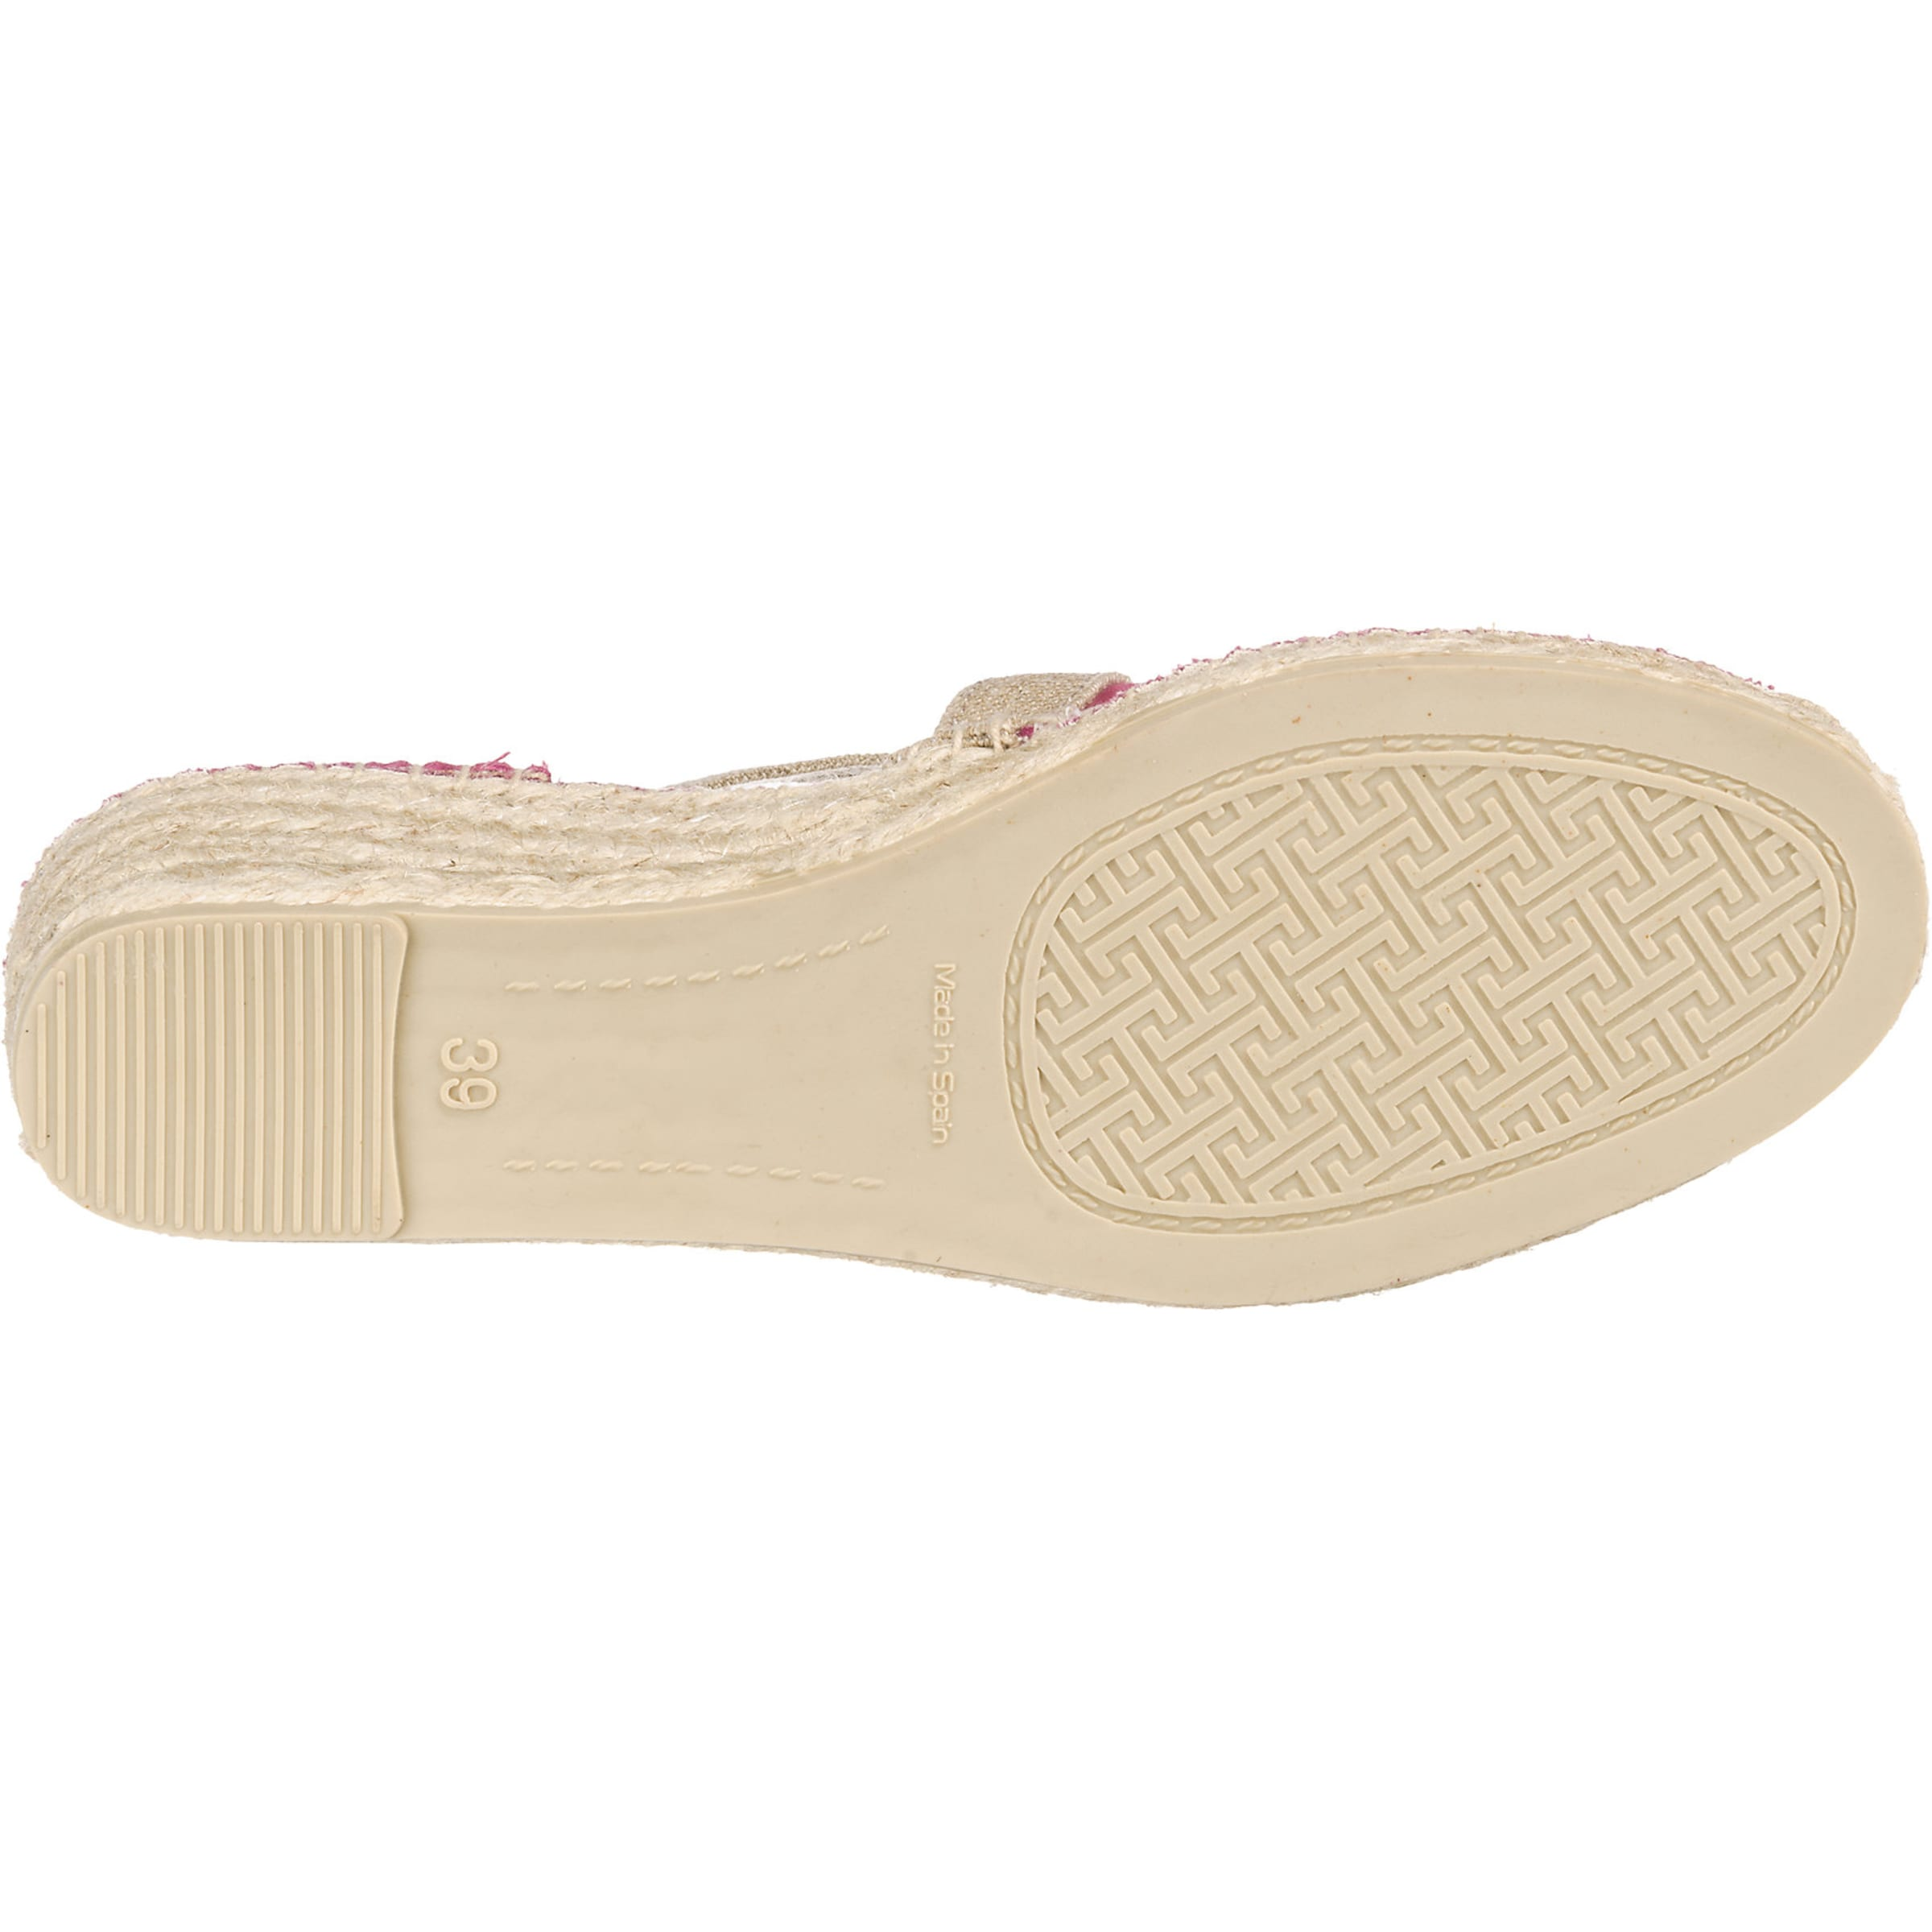 Sandaletten 'tona' In BeigeEosin Pons Toni R4AjL5